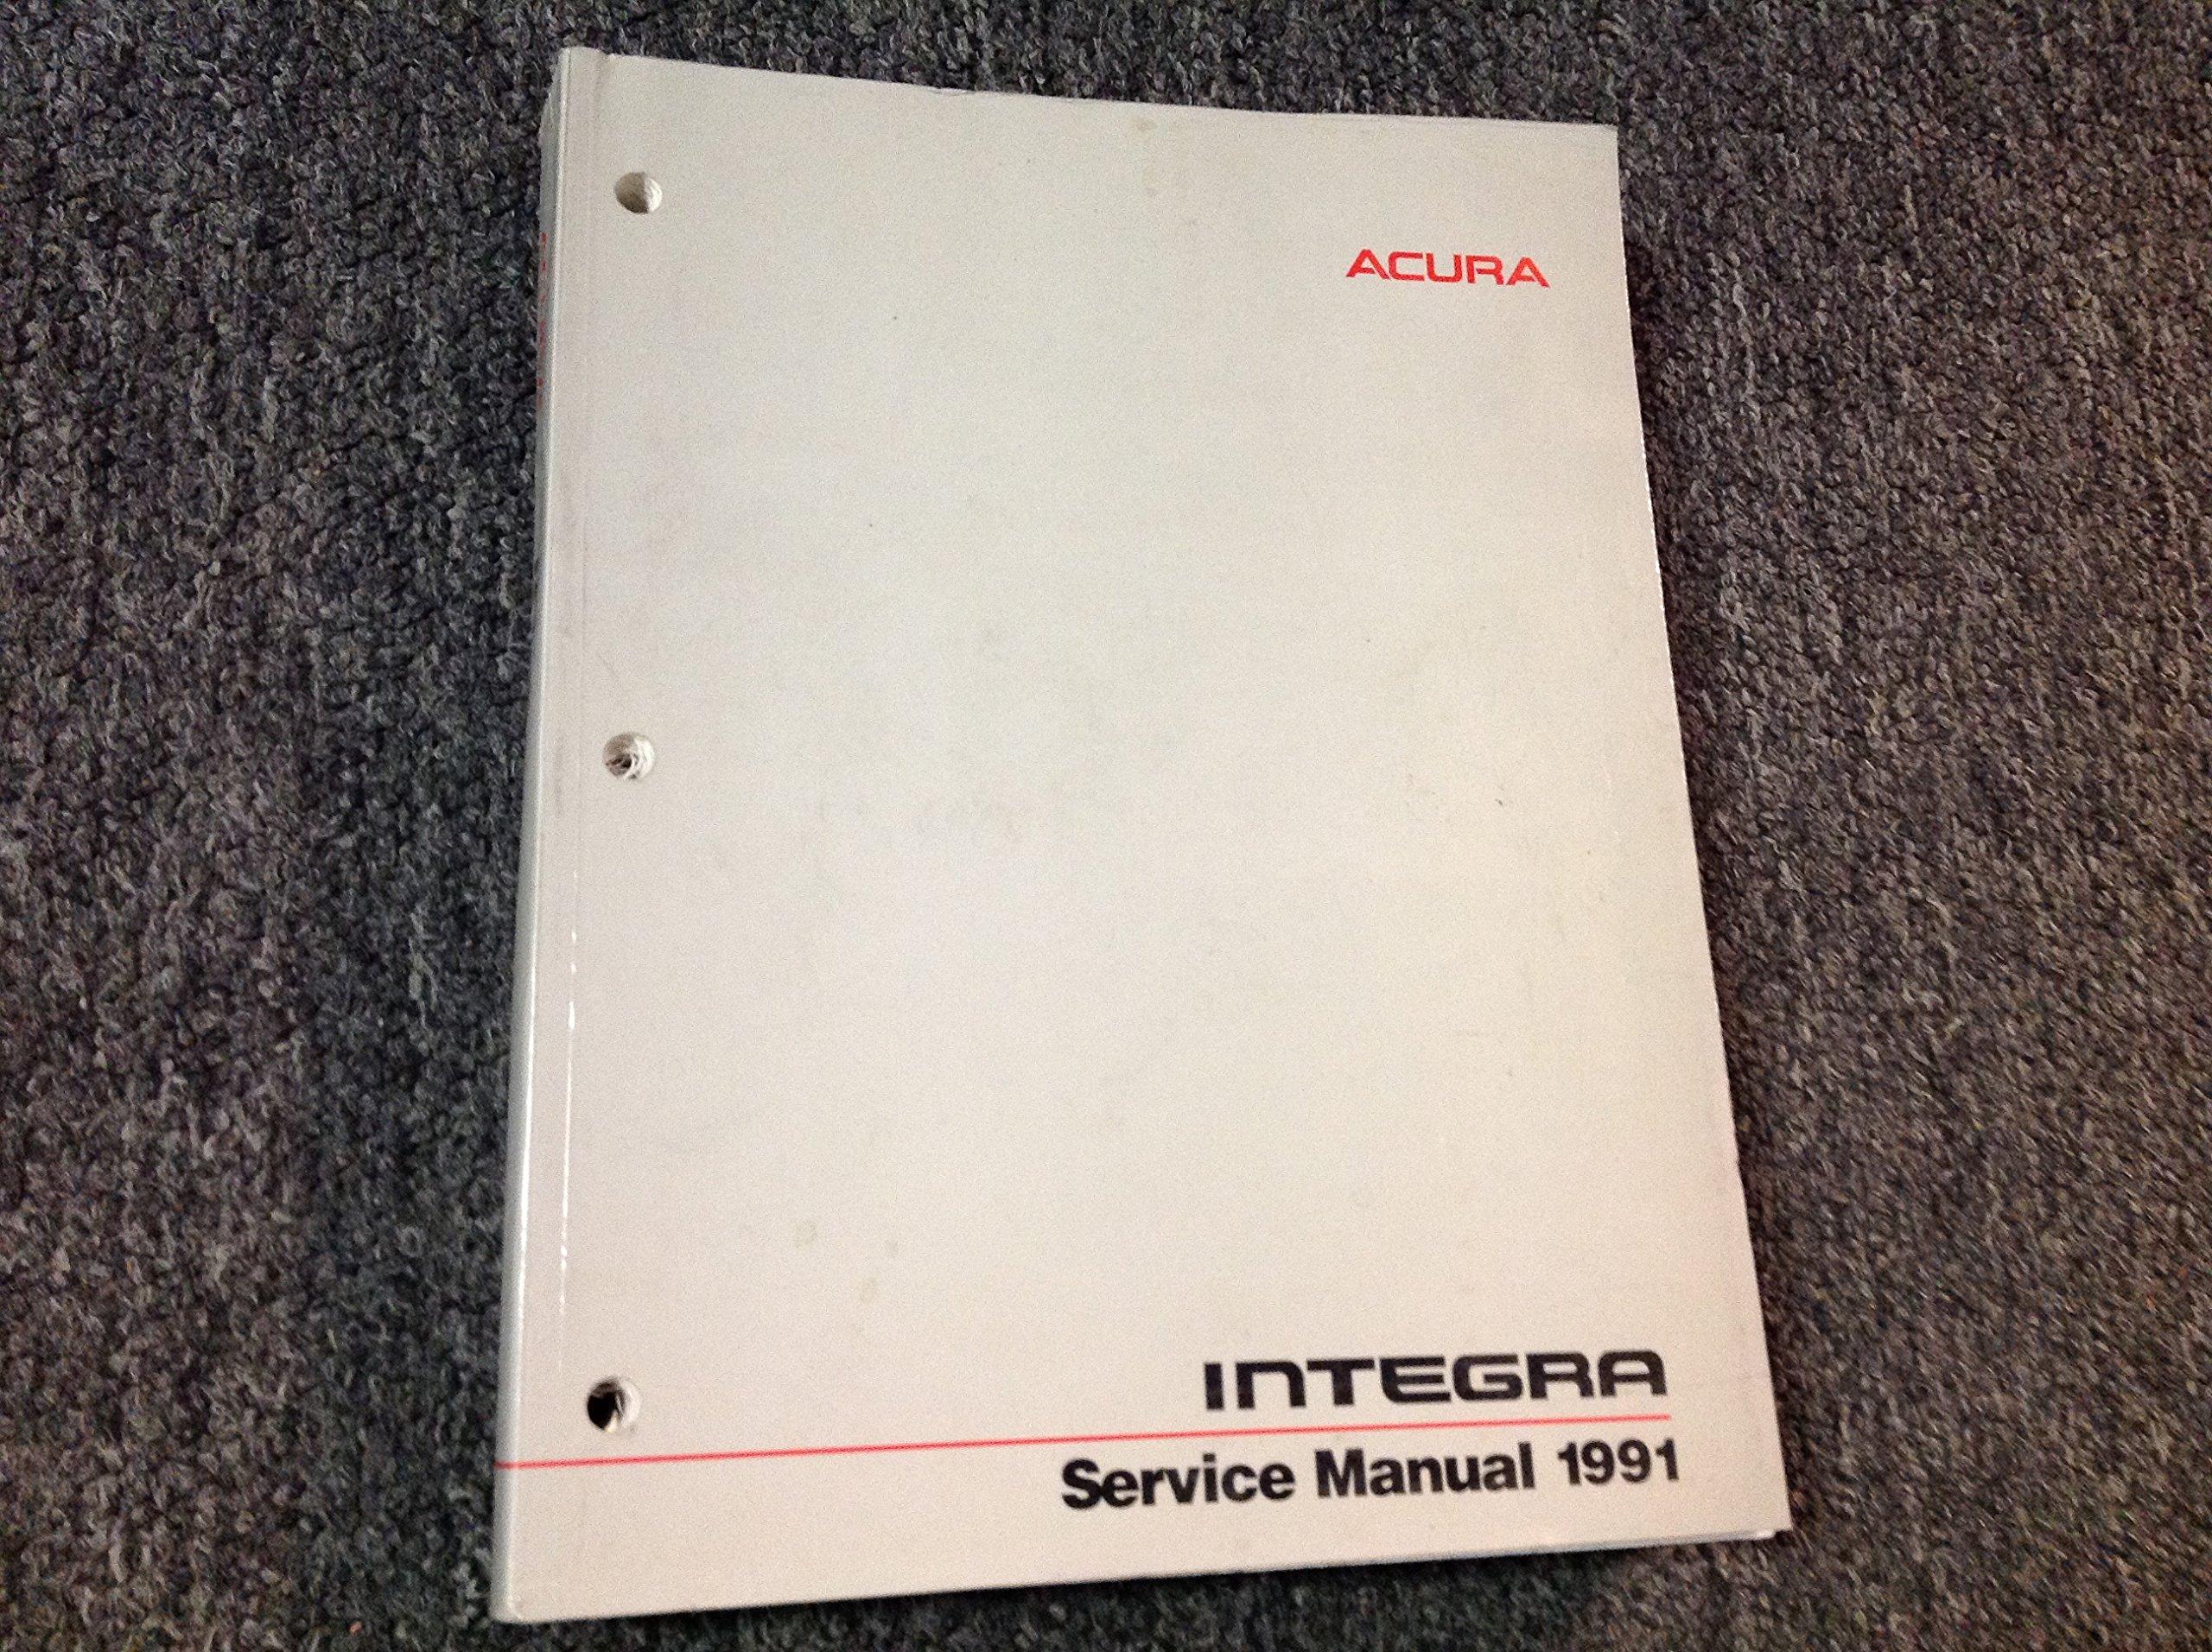 acura integra service manual 1991 honda motor company service rh amazon com 1991 acura integra service manual pdf 1991 acura legend service manual pdf